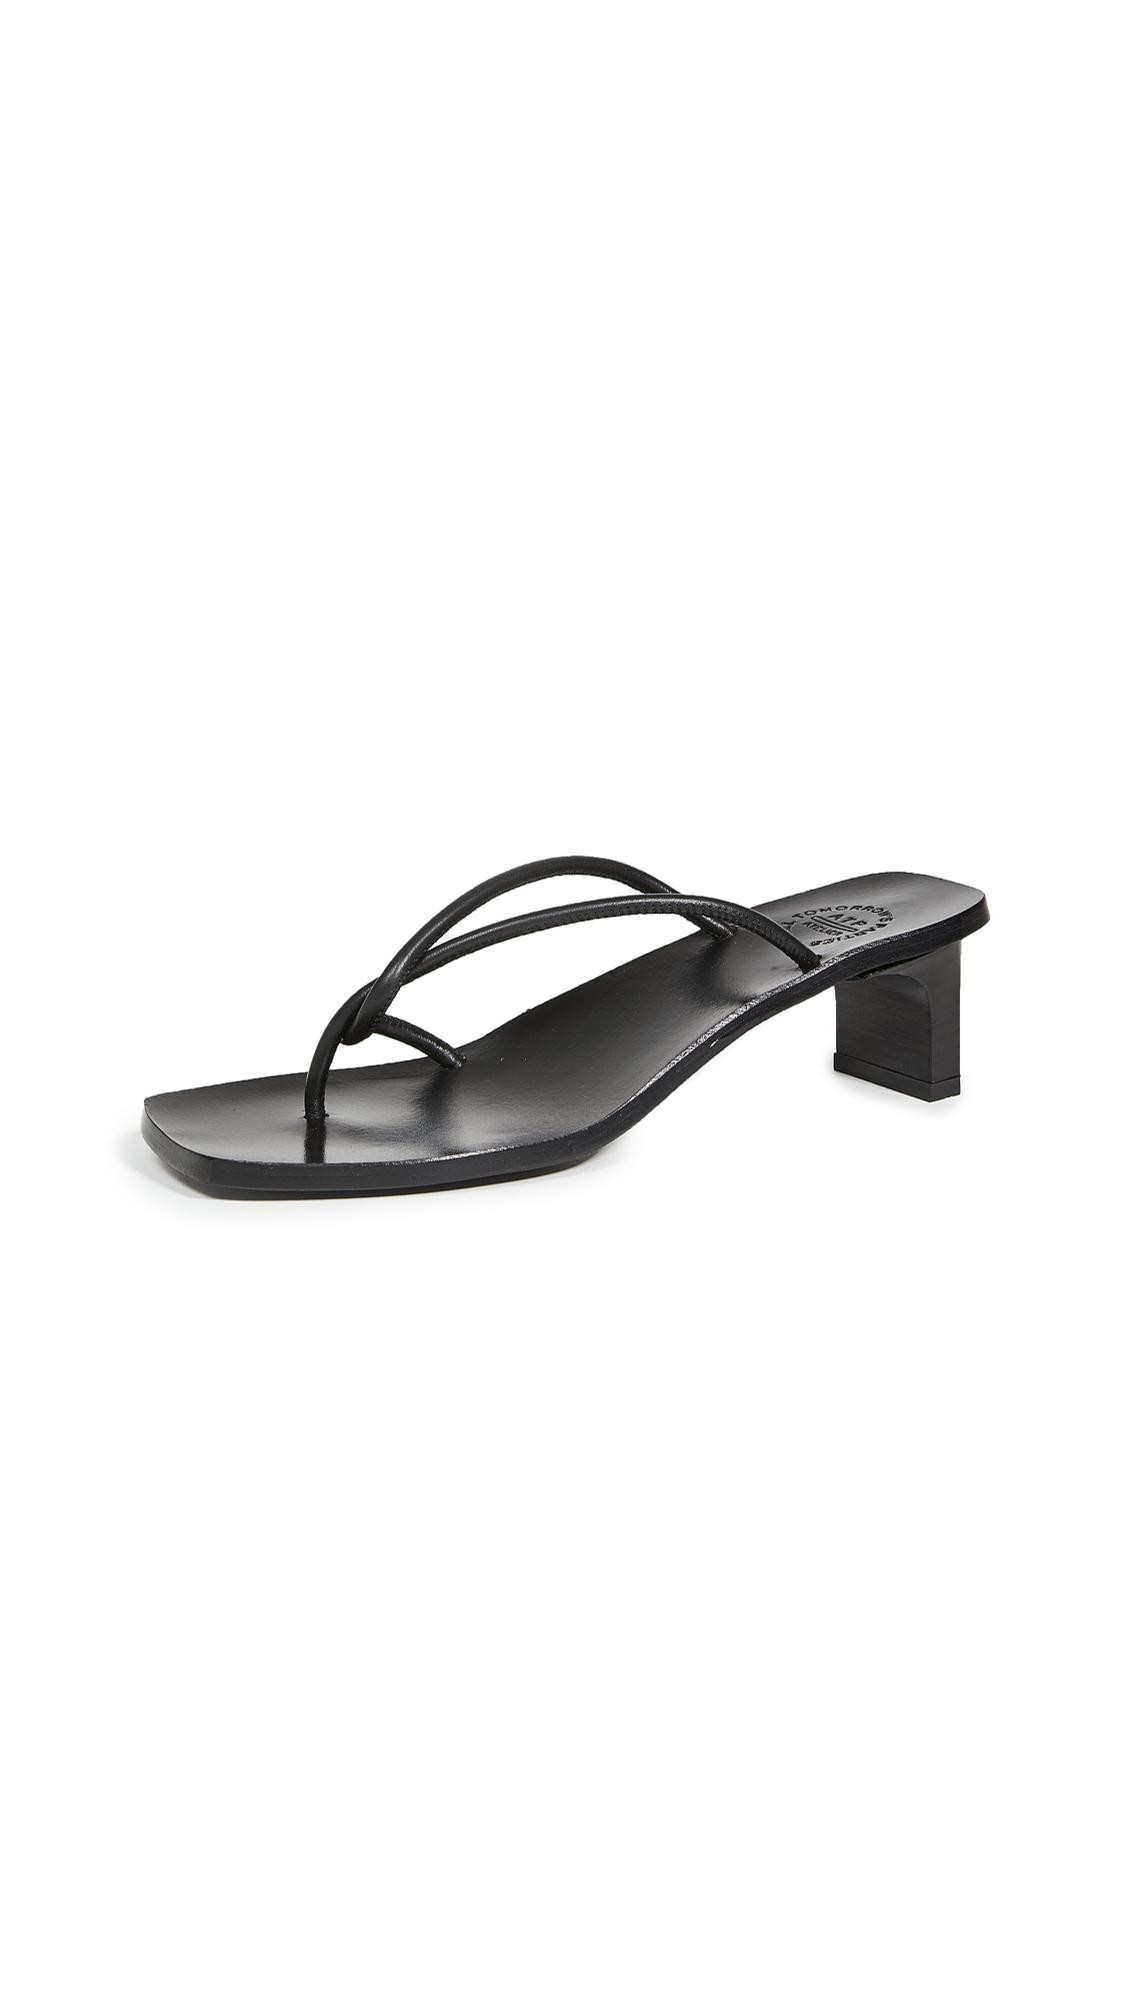 Buy ATP Atelier Panza Strappy Sandals online, shop ATP Atelier